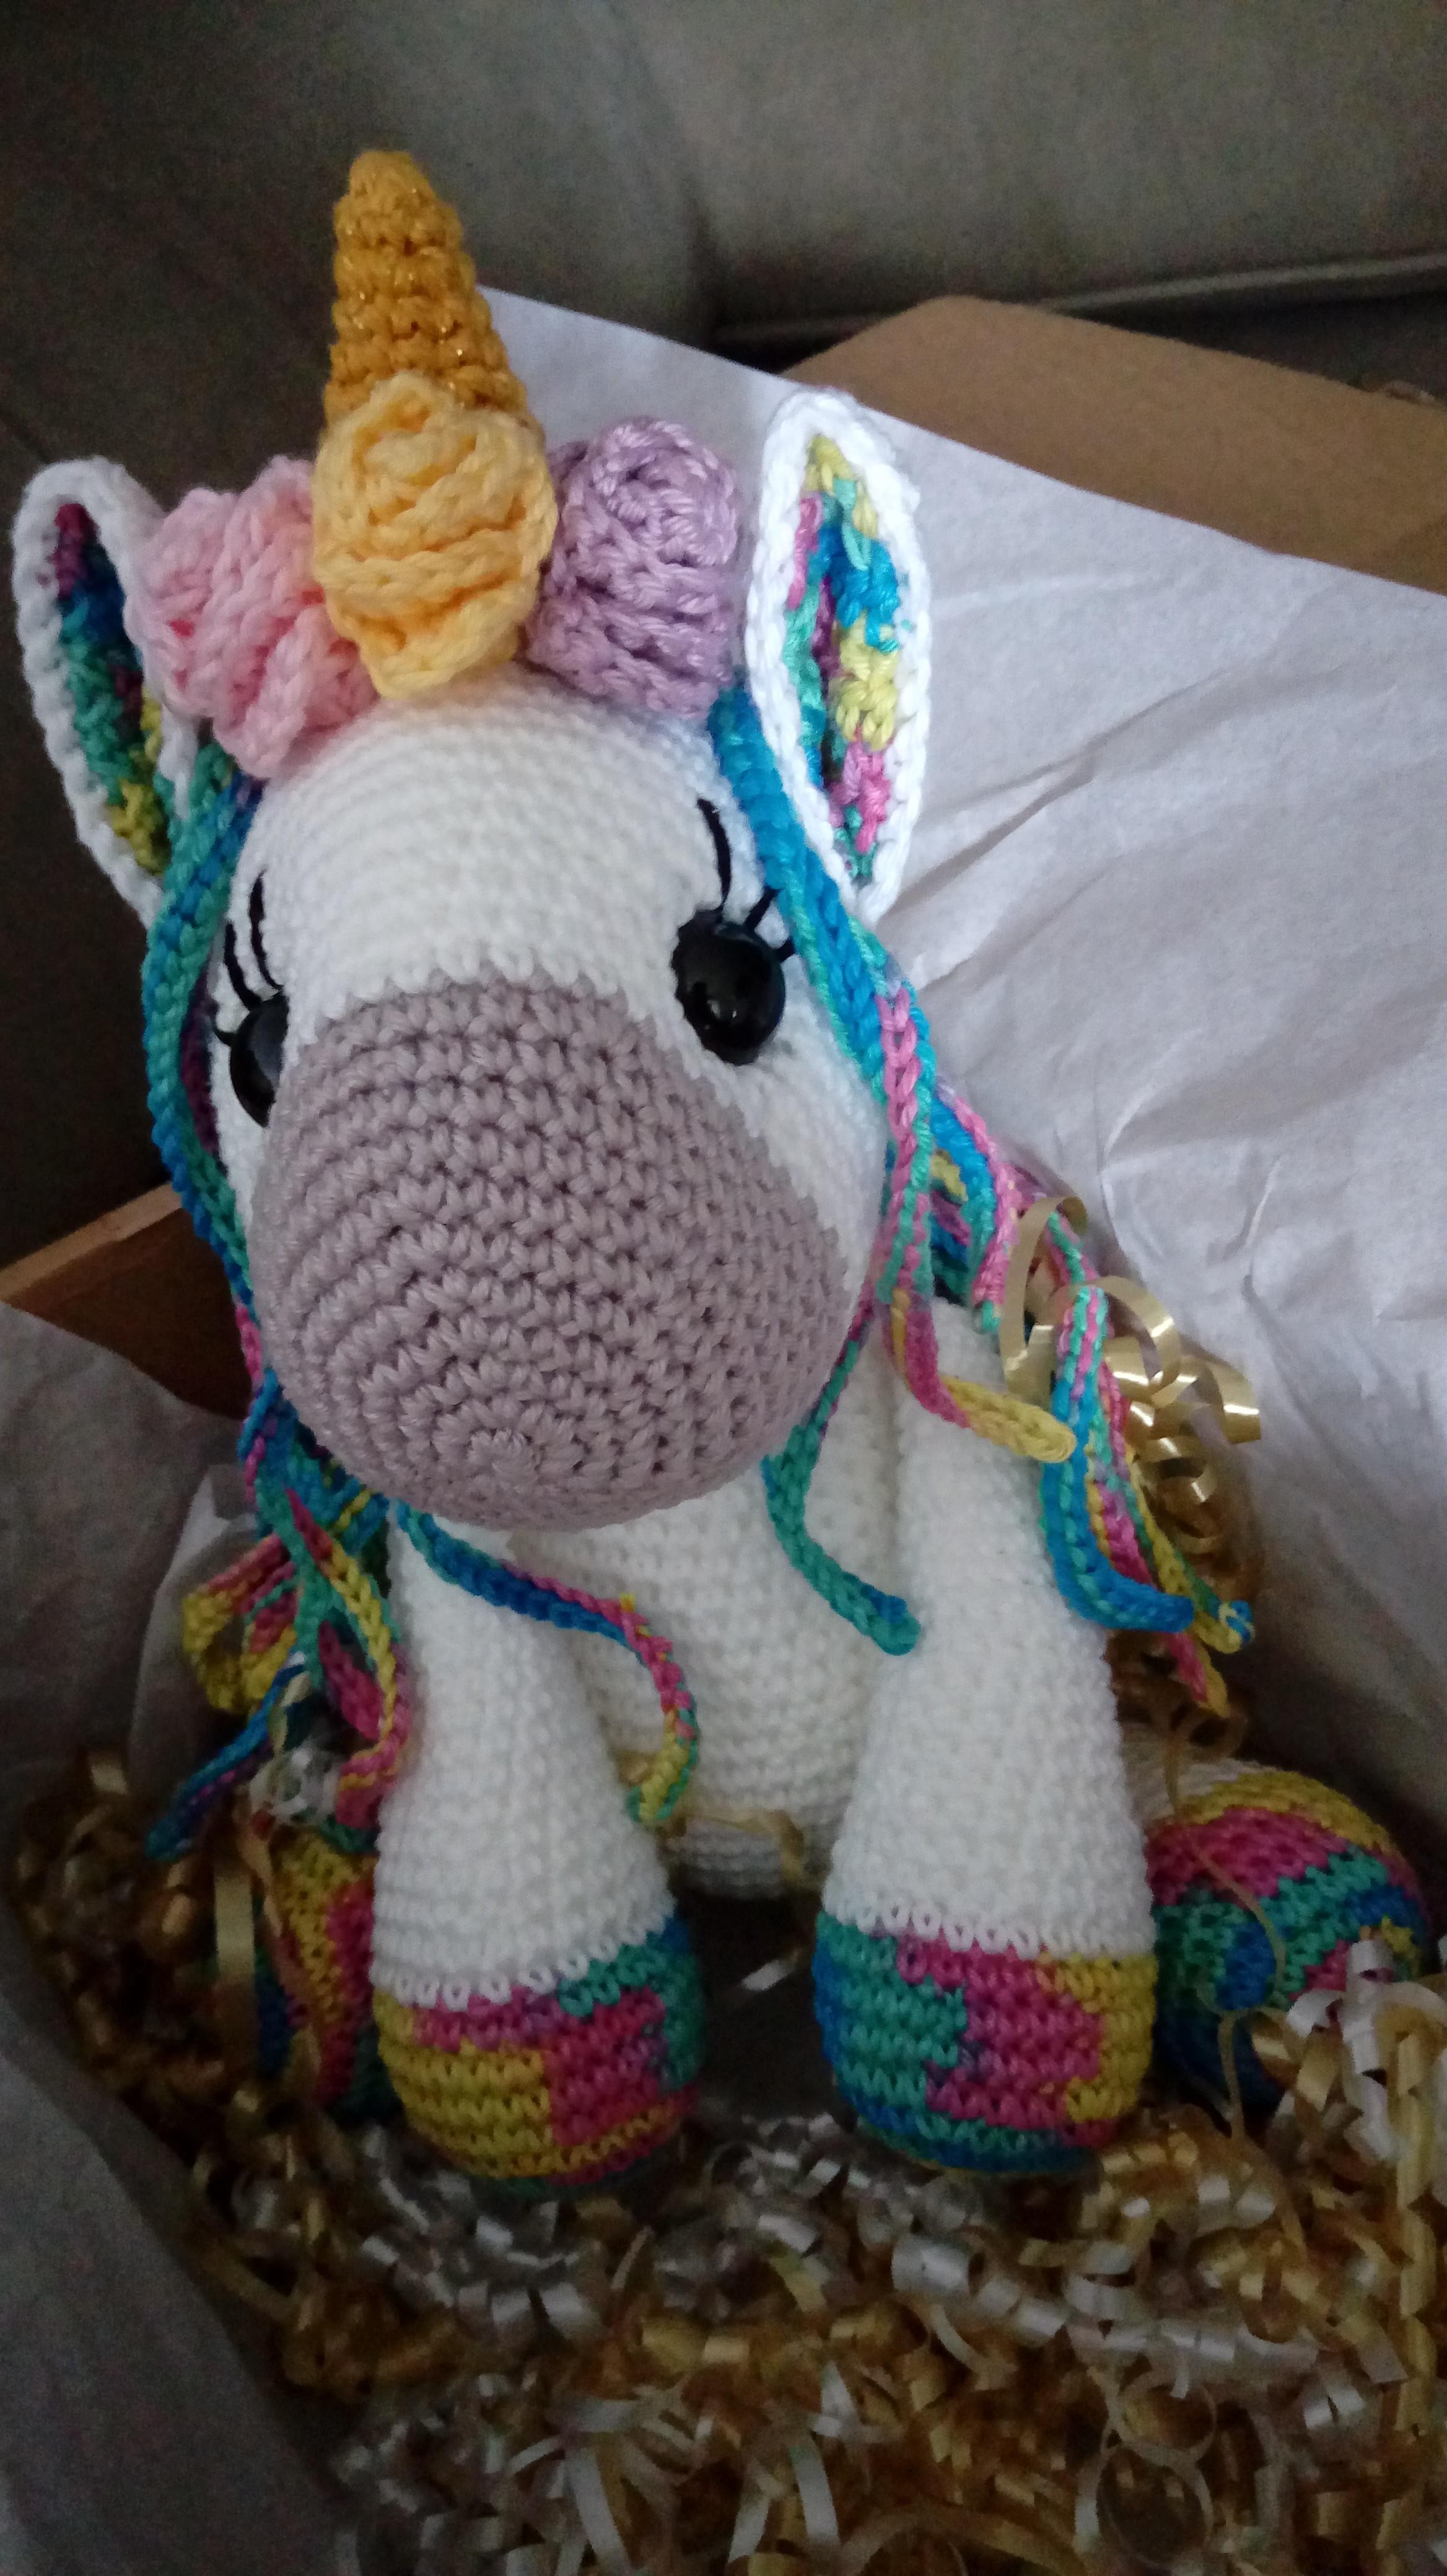 Unicórnio mini amigurumi – Bonek de Crochê | 4160x2336